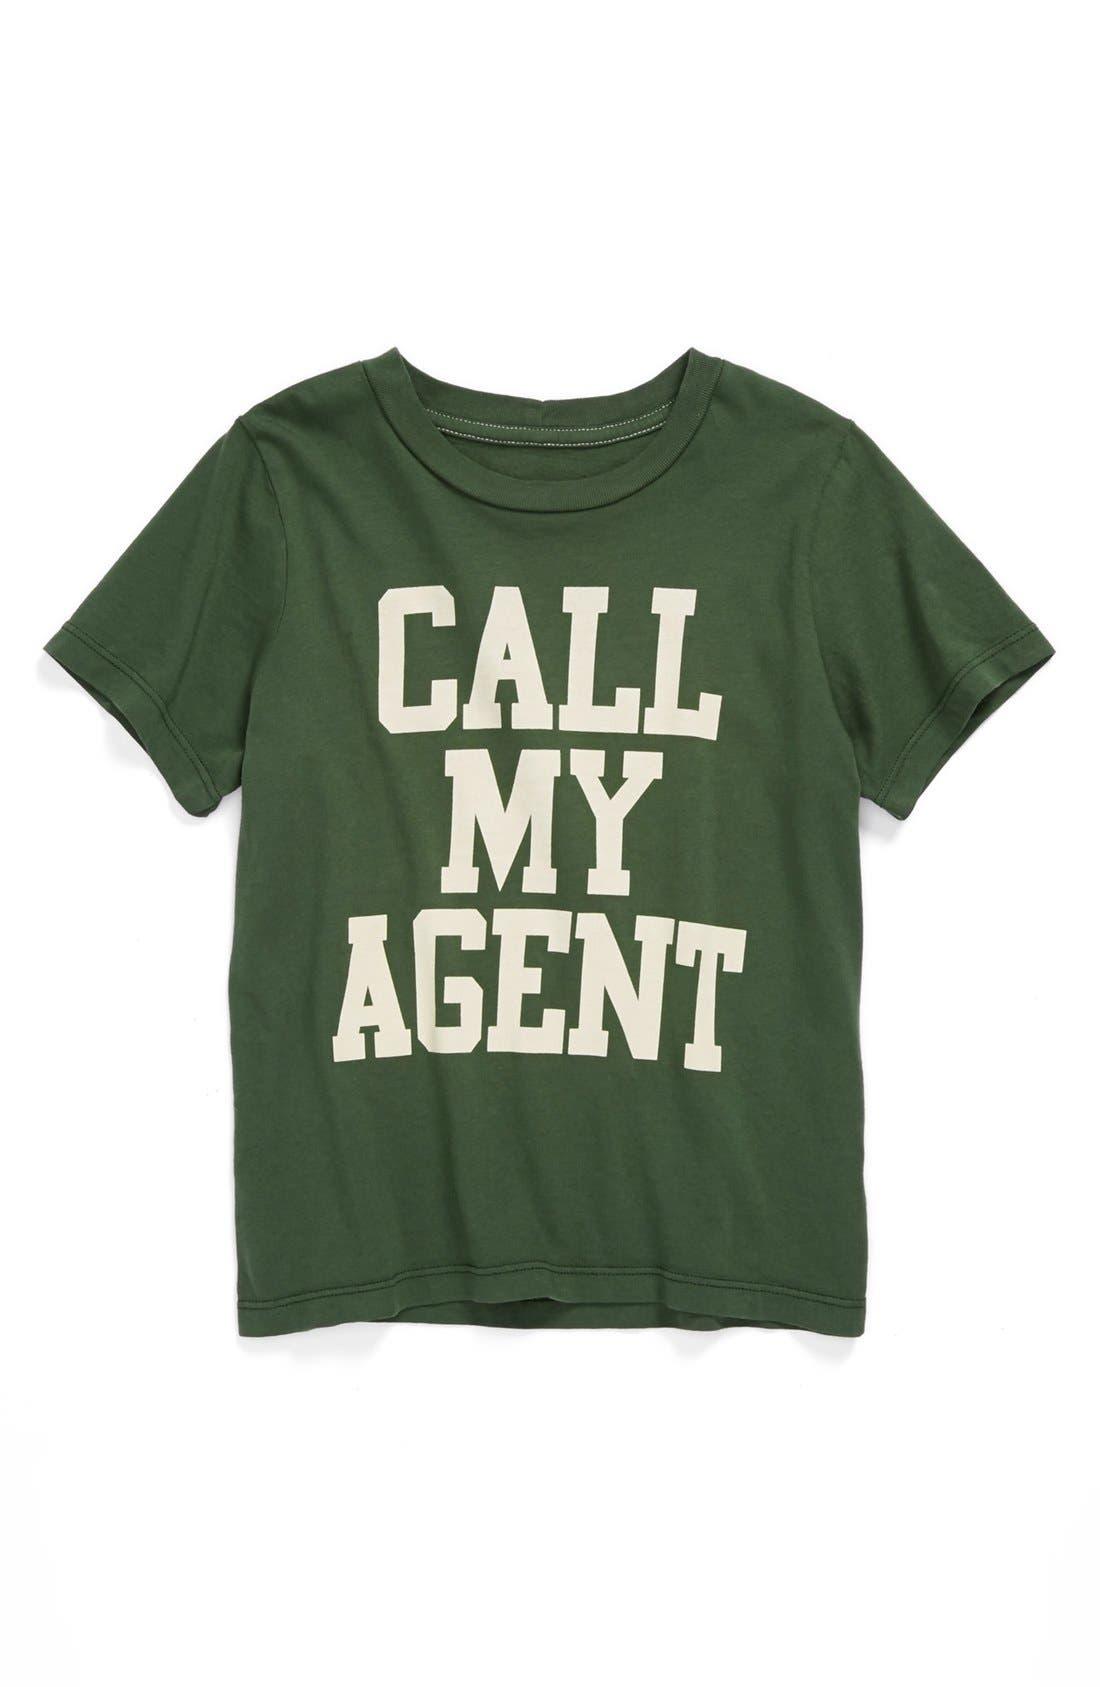 Alternate Image 1 Selected - Peek 'Call My Agent' T-Shirt (Toddler Boys, Little Boys & Big Boys)